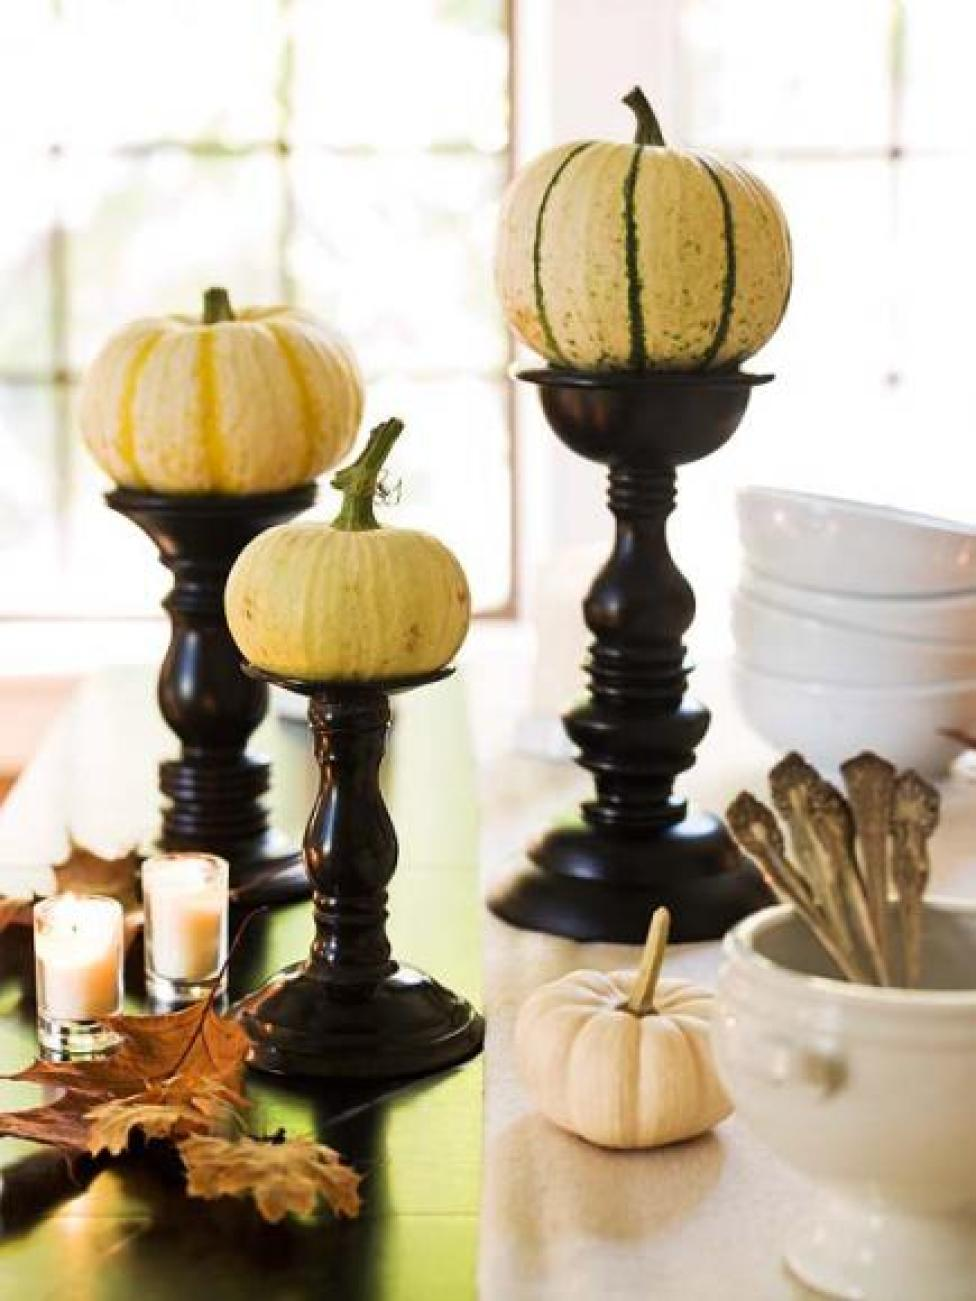 Creative candlesticks